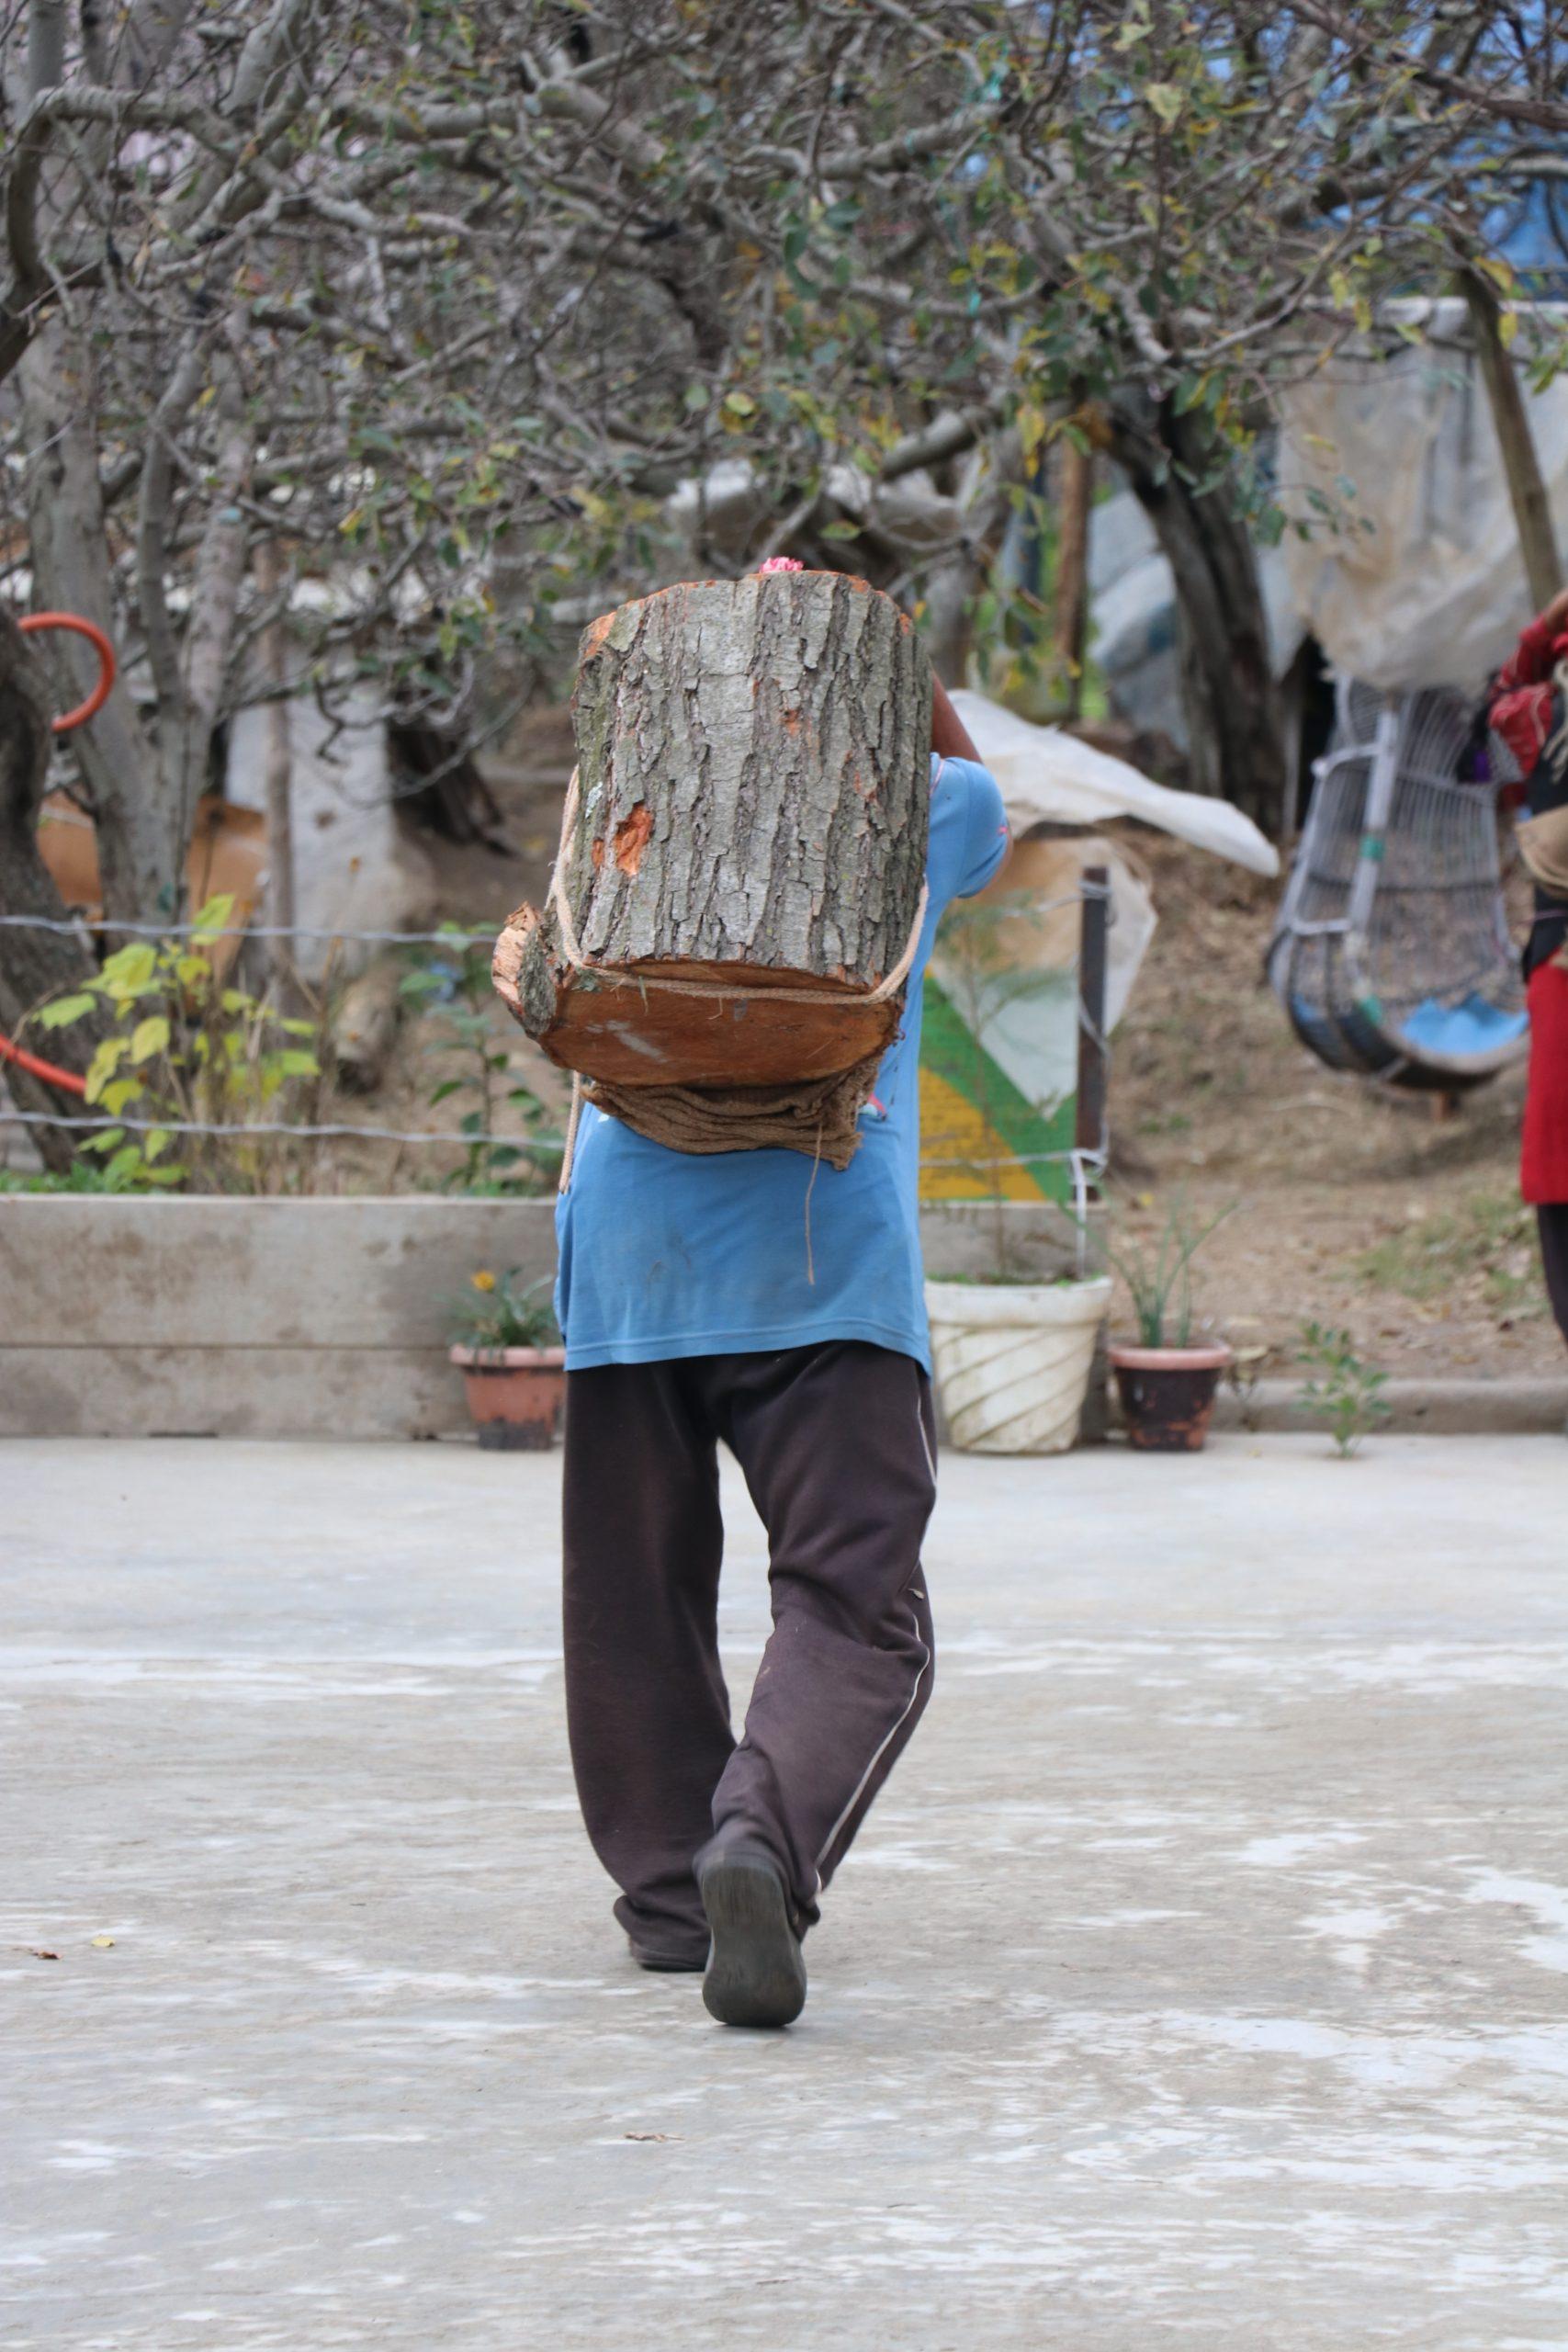 A man carrying wooden log